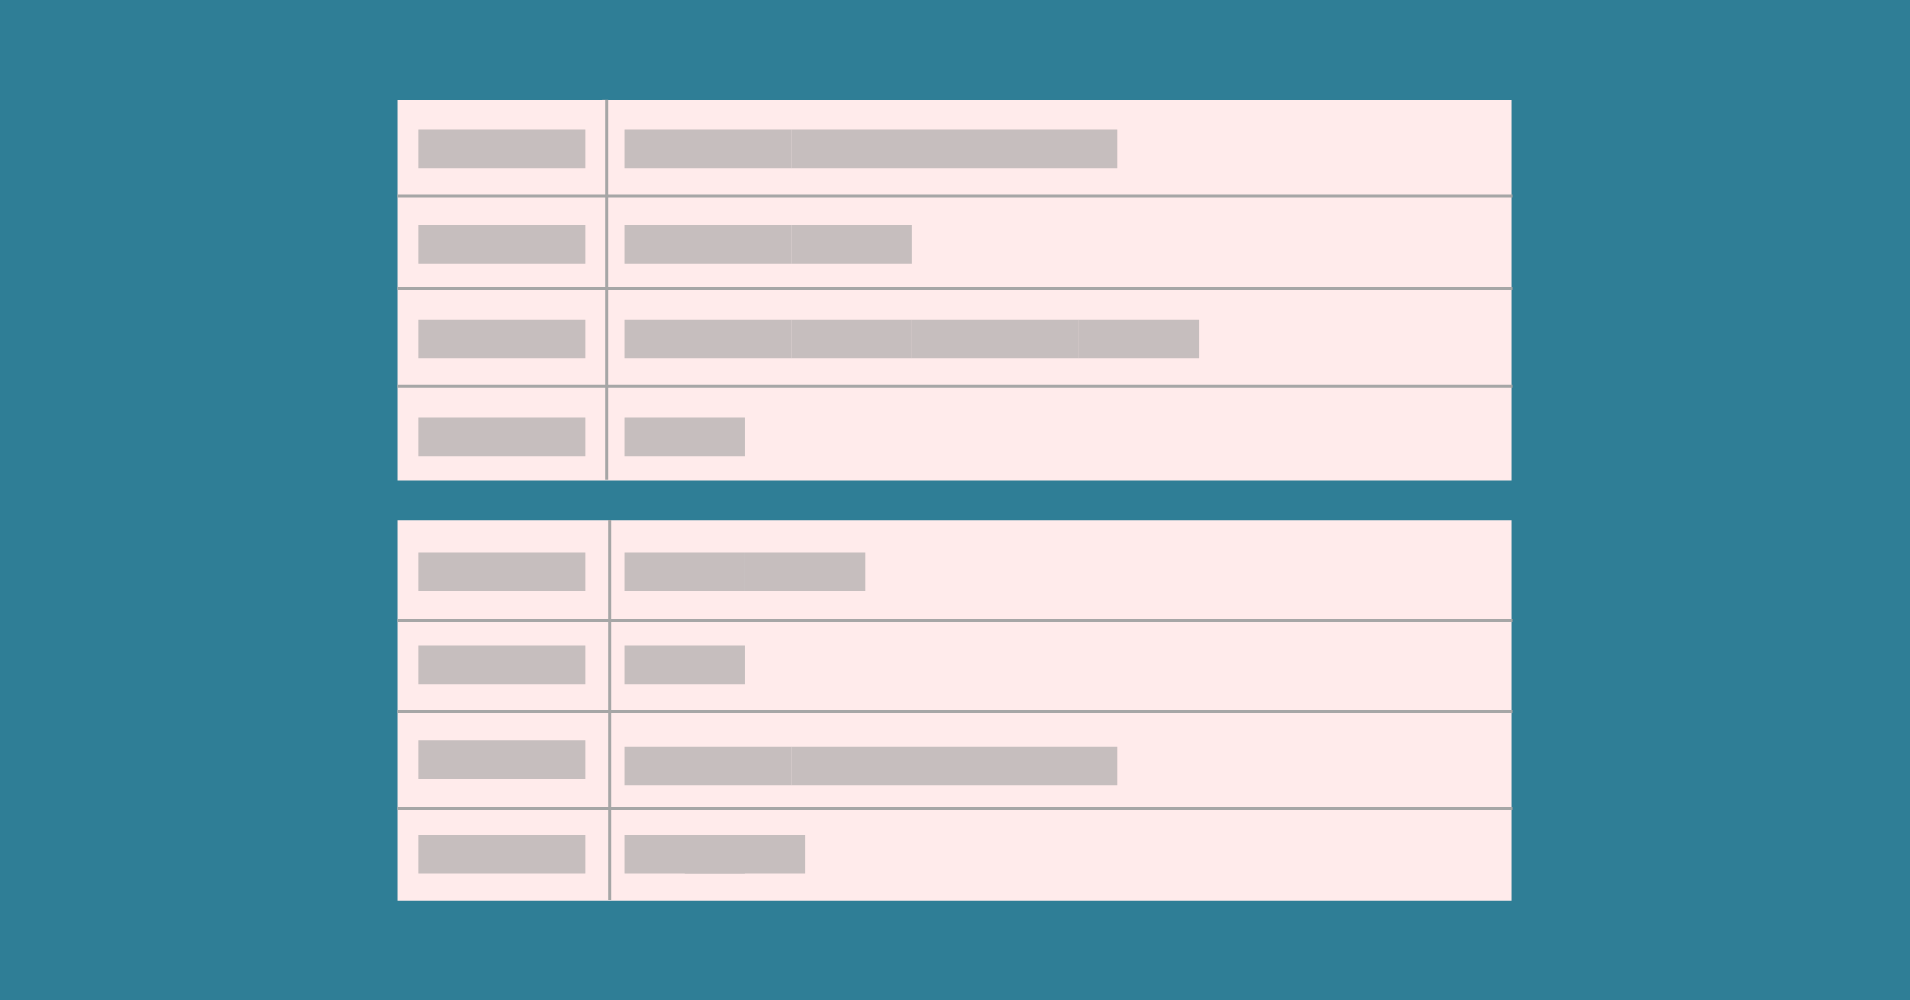 stackable tables in WordPress